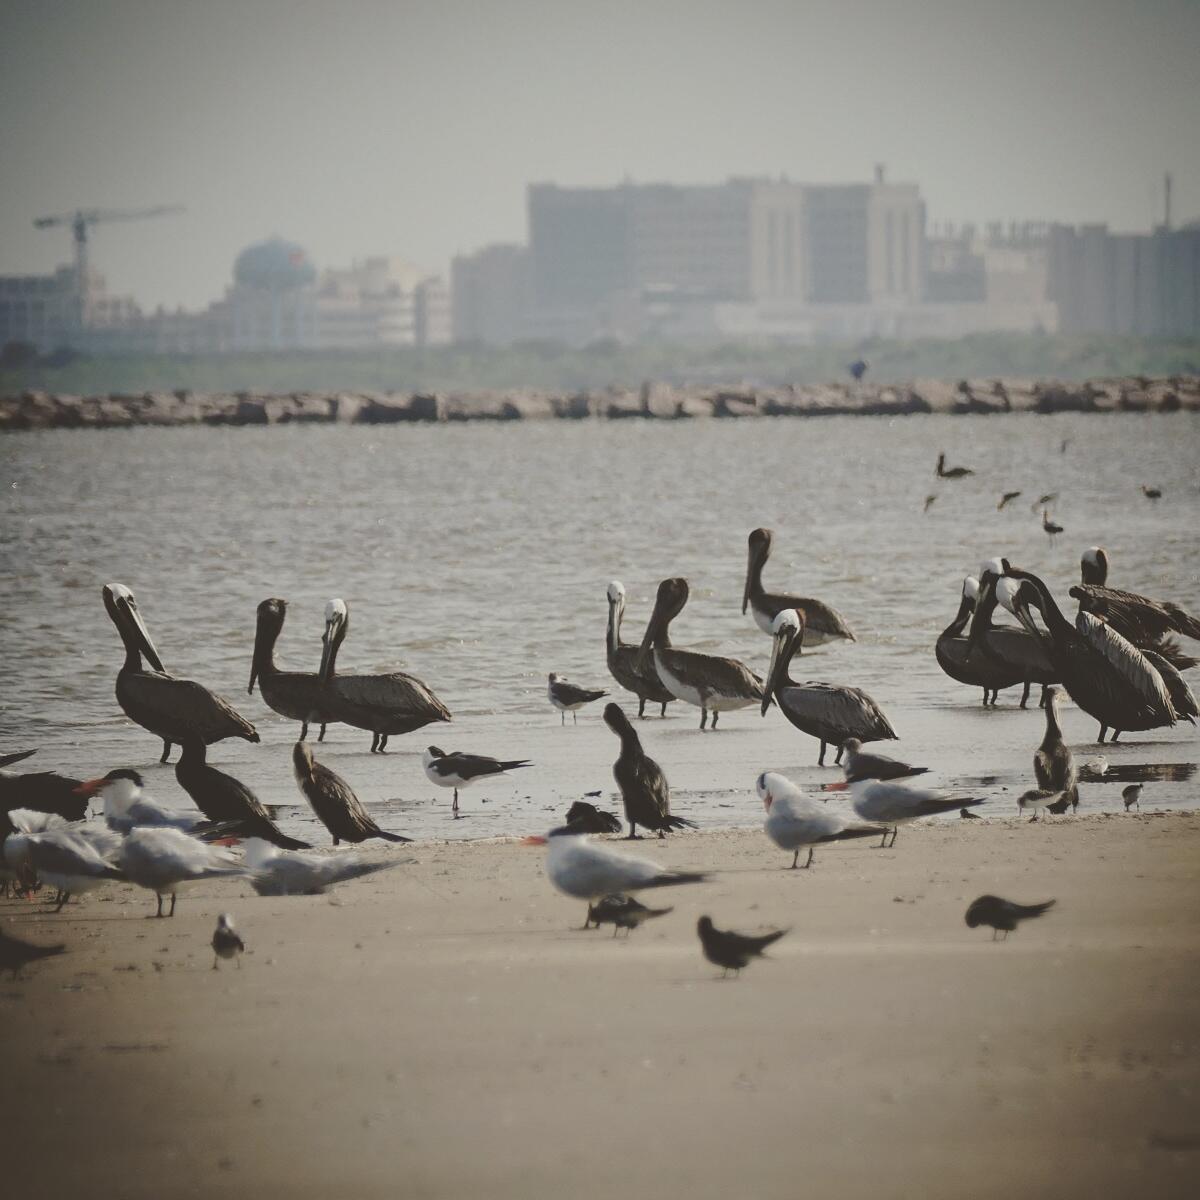 Pelicans, gulls, and shorebirds gather at Bolivar Flats. Noah Strycker